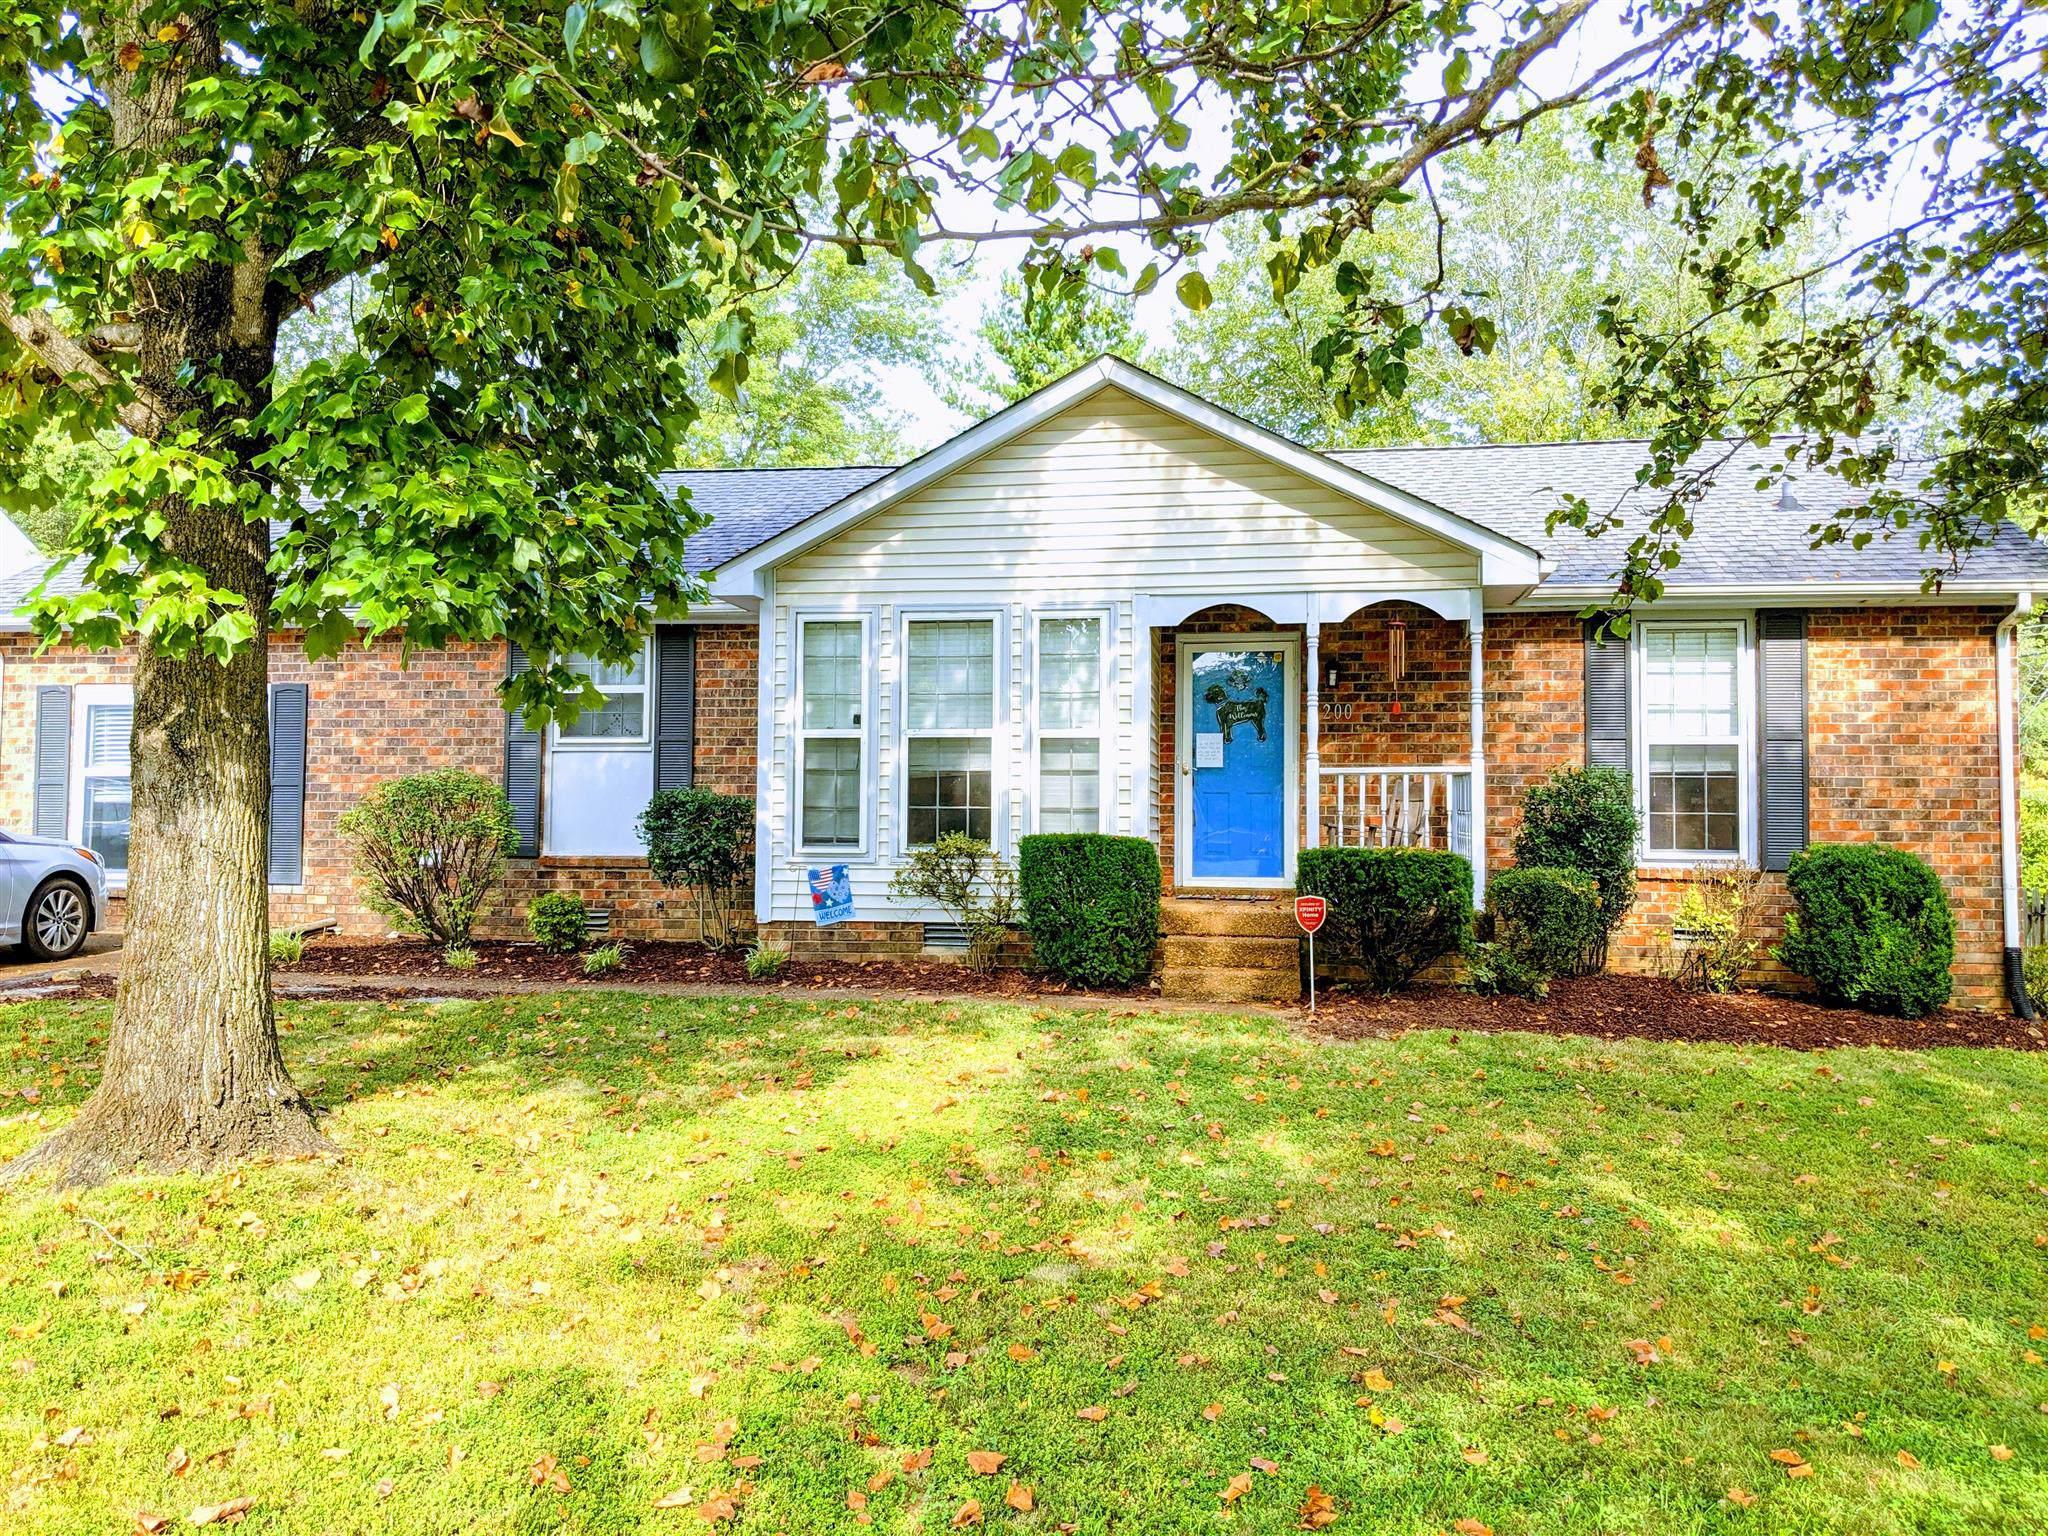 1200 Reelfoot Cir, Nashville, TN 37214 (MLS #RTC2073149) :: RE/MAX Homes And Estates